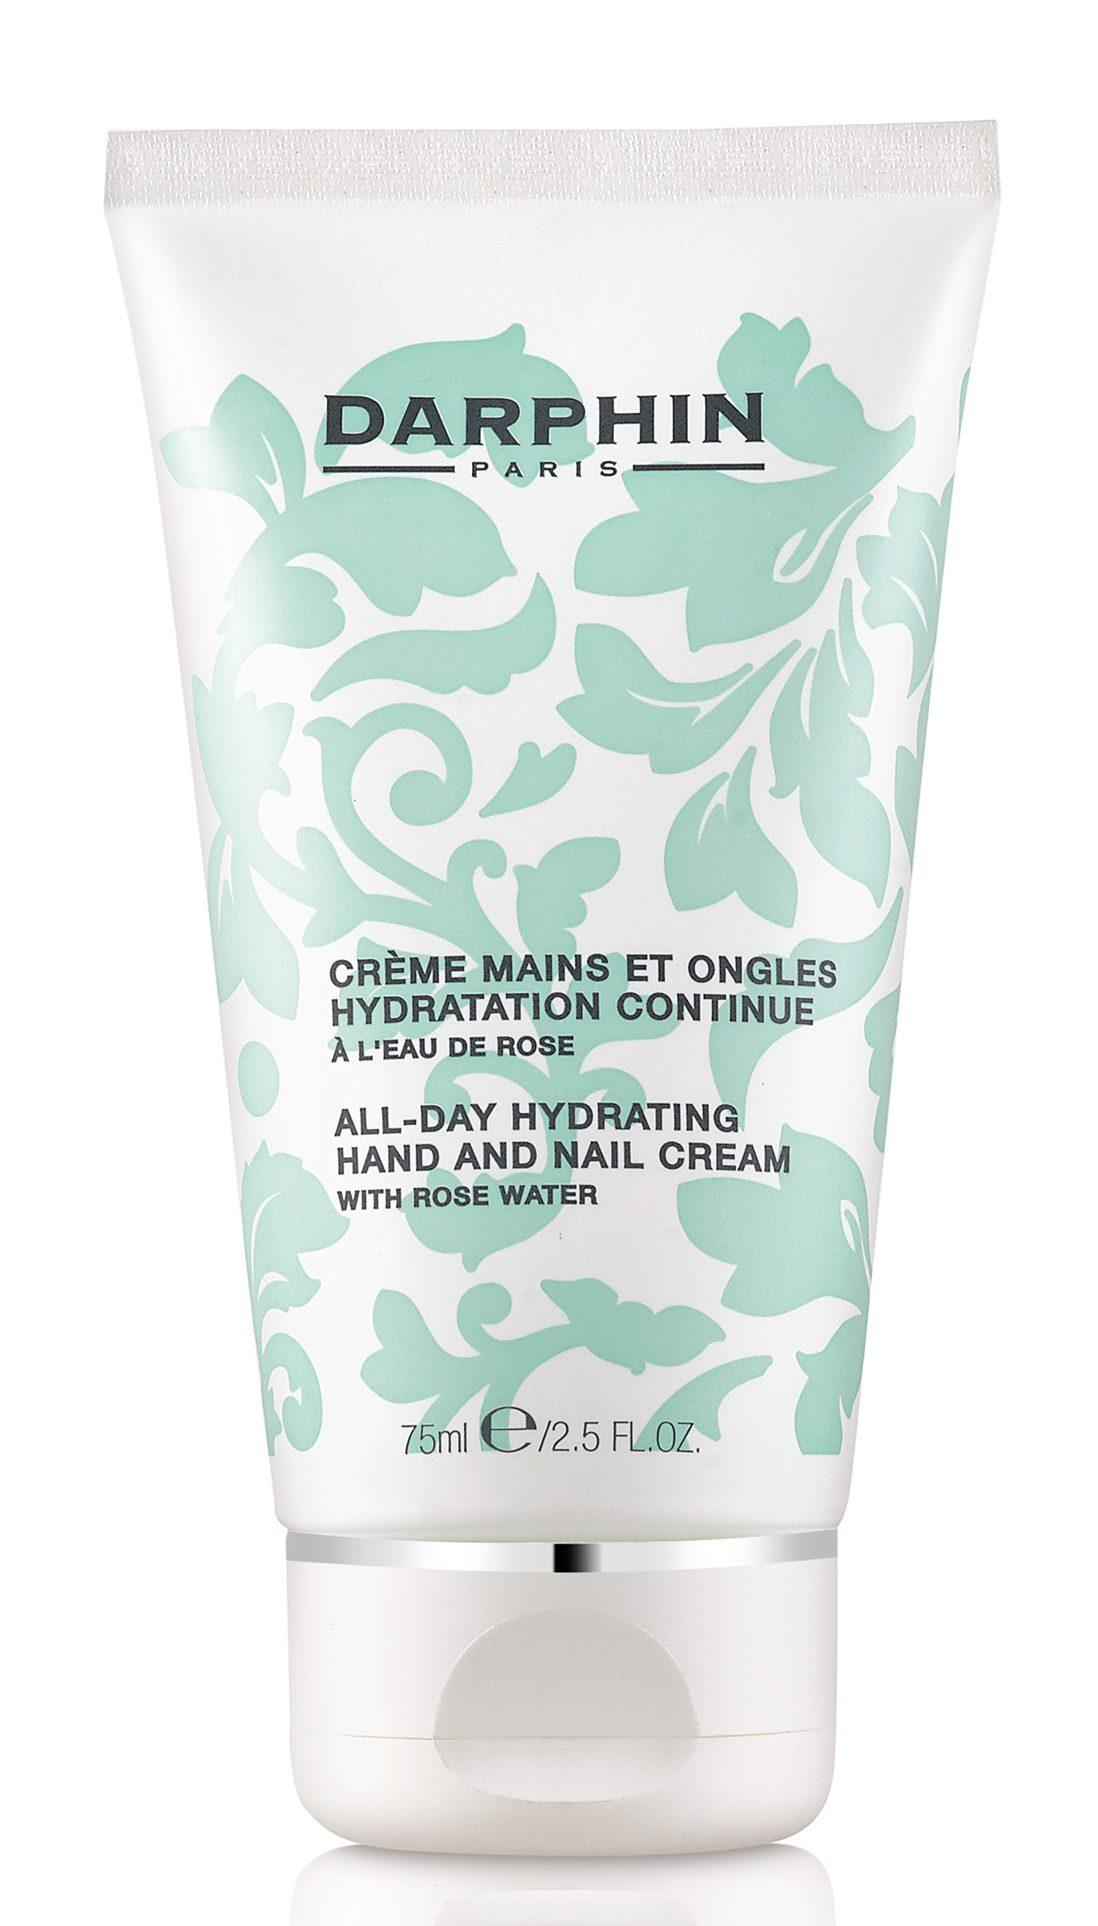 Darphin håndcreme